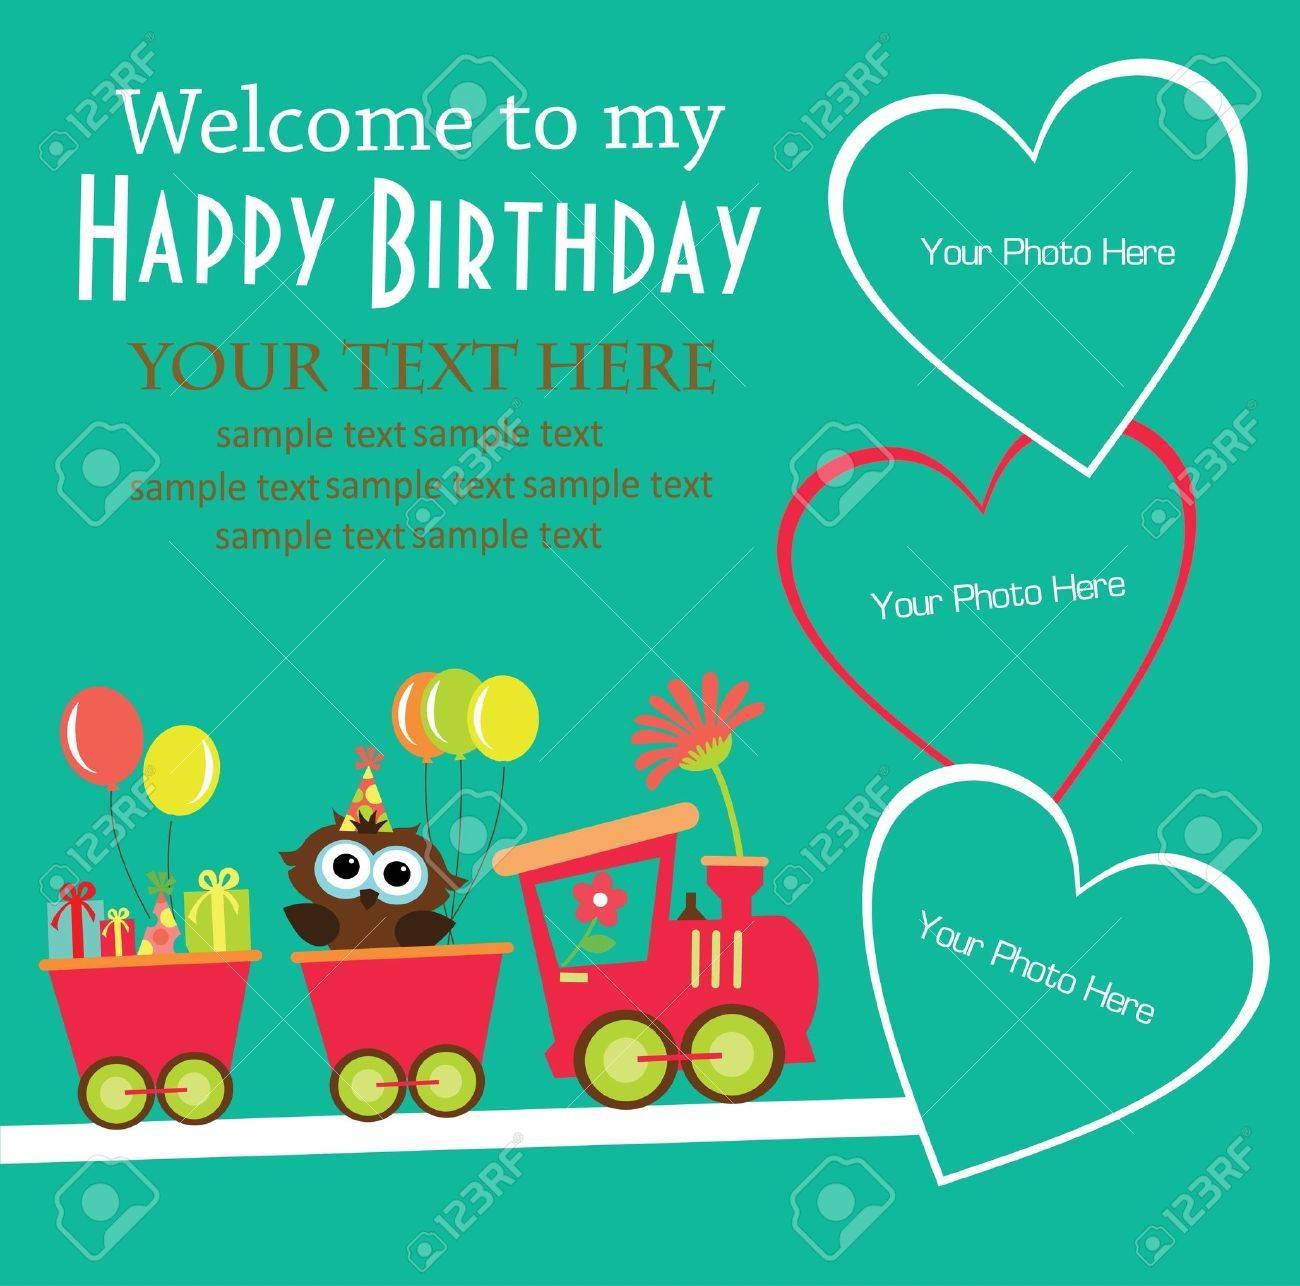 Kids Invitation Cards birth greeting cards design – Kids Birthday Card Invitations